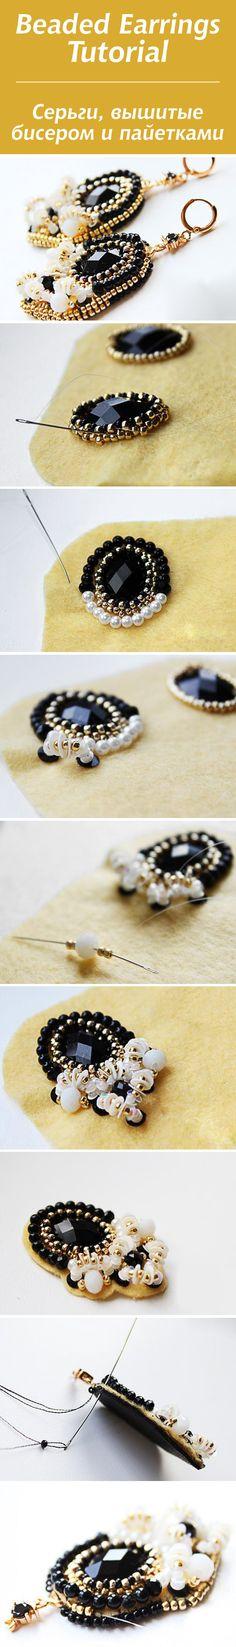 Bead embroidery: Earrings tutorial / (Вышитые бисером и пайетками серьги)